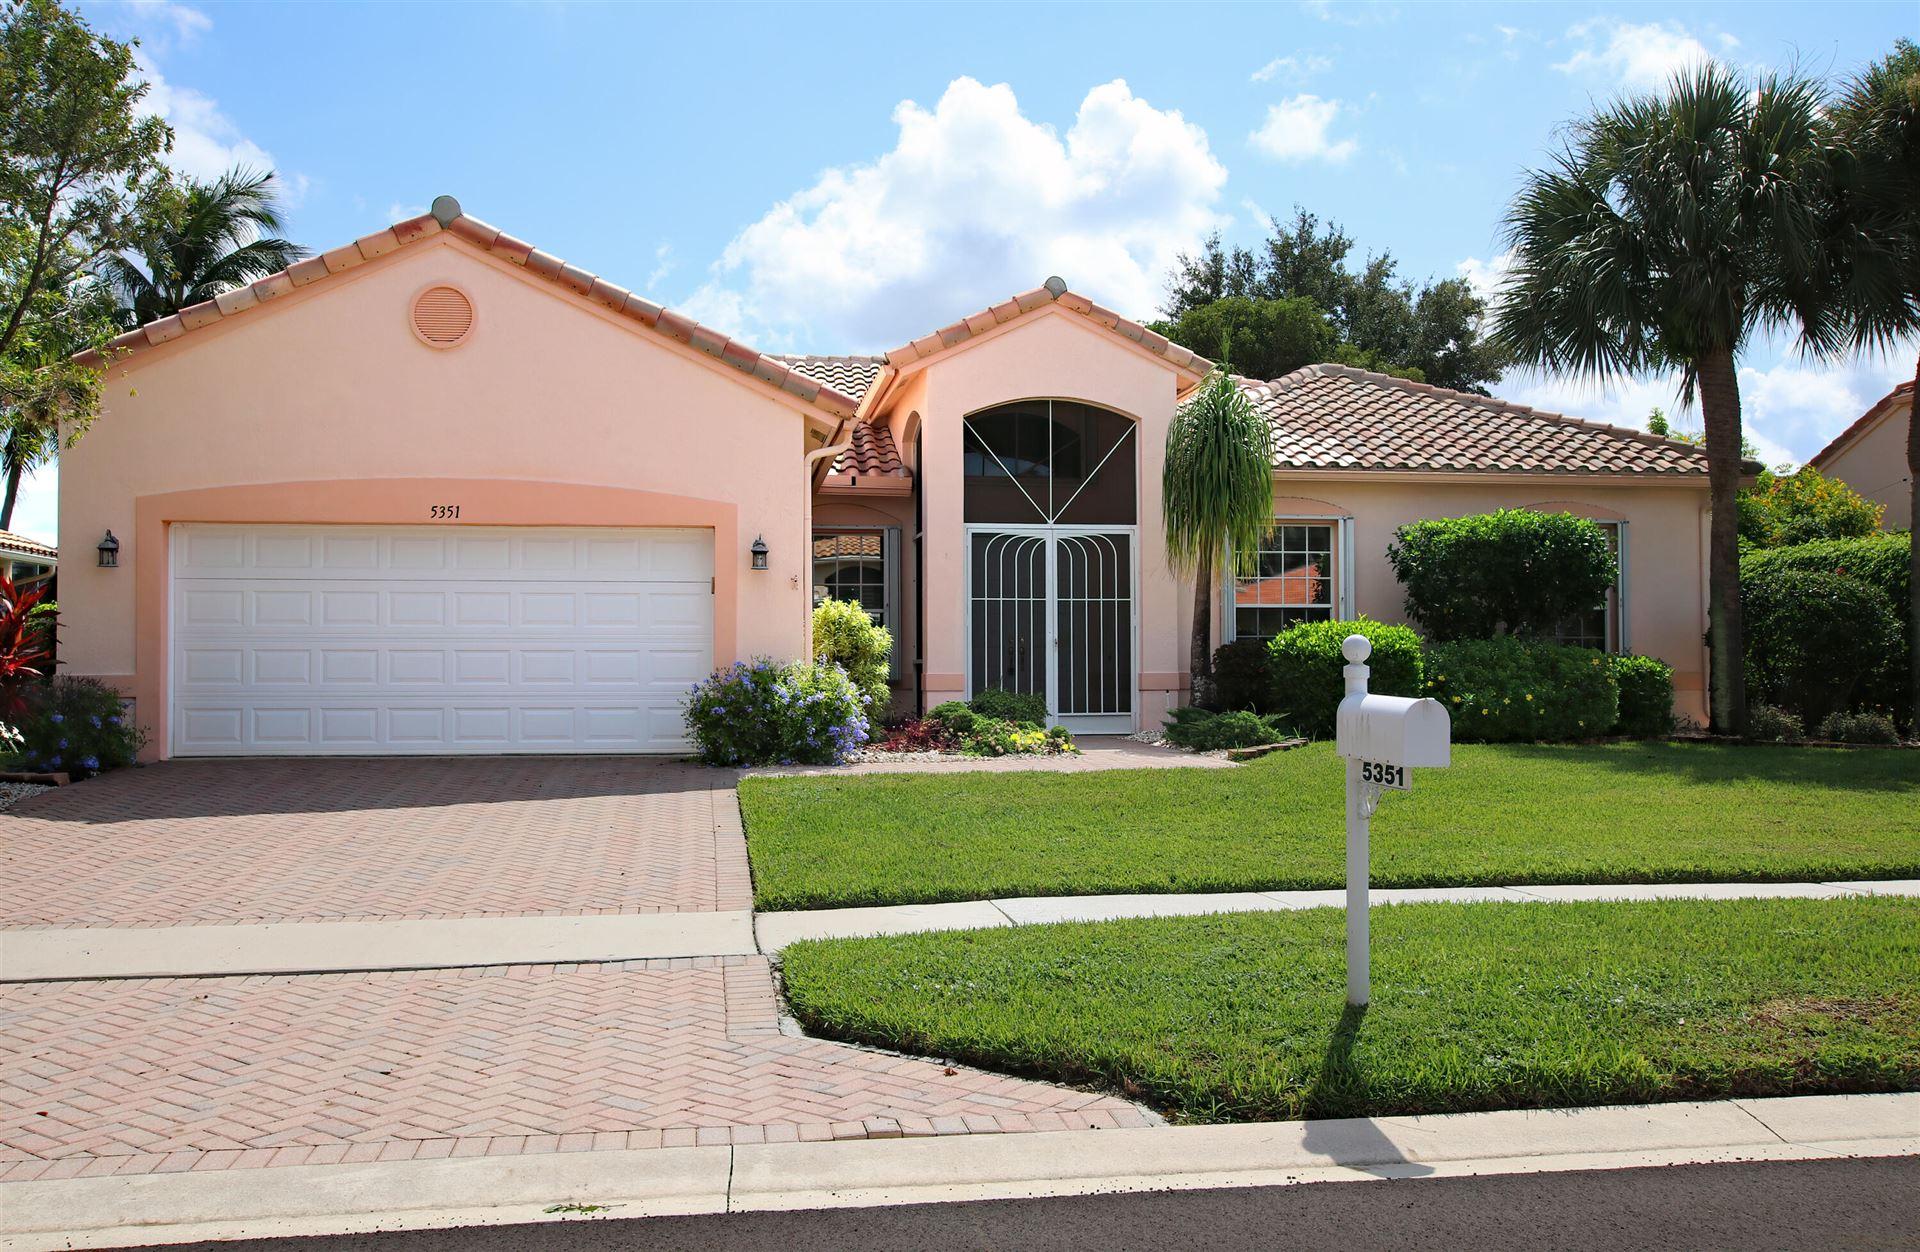 5351 Landon Circle, Boynton Beach, FL 33437 - #: RX-10743391